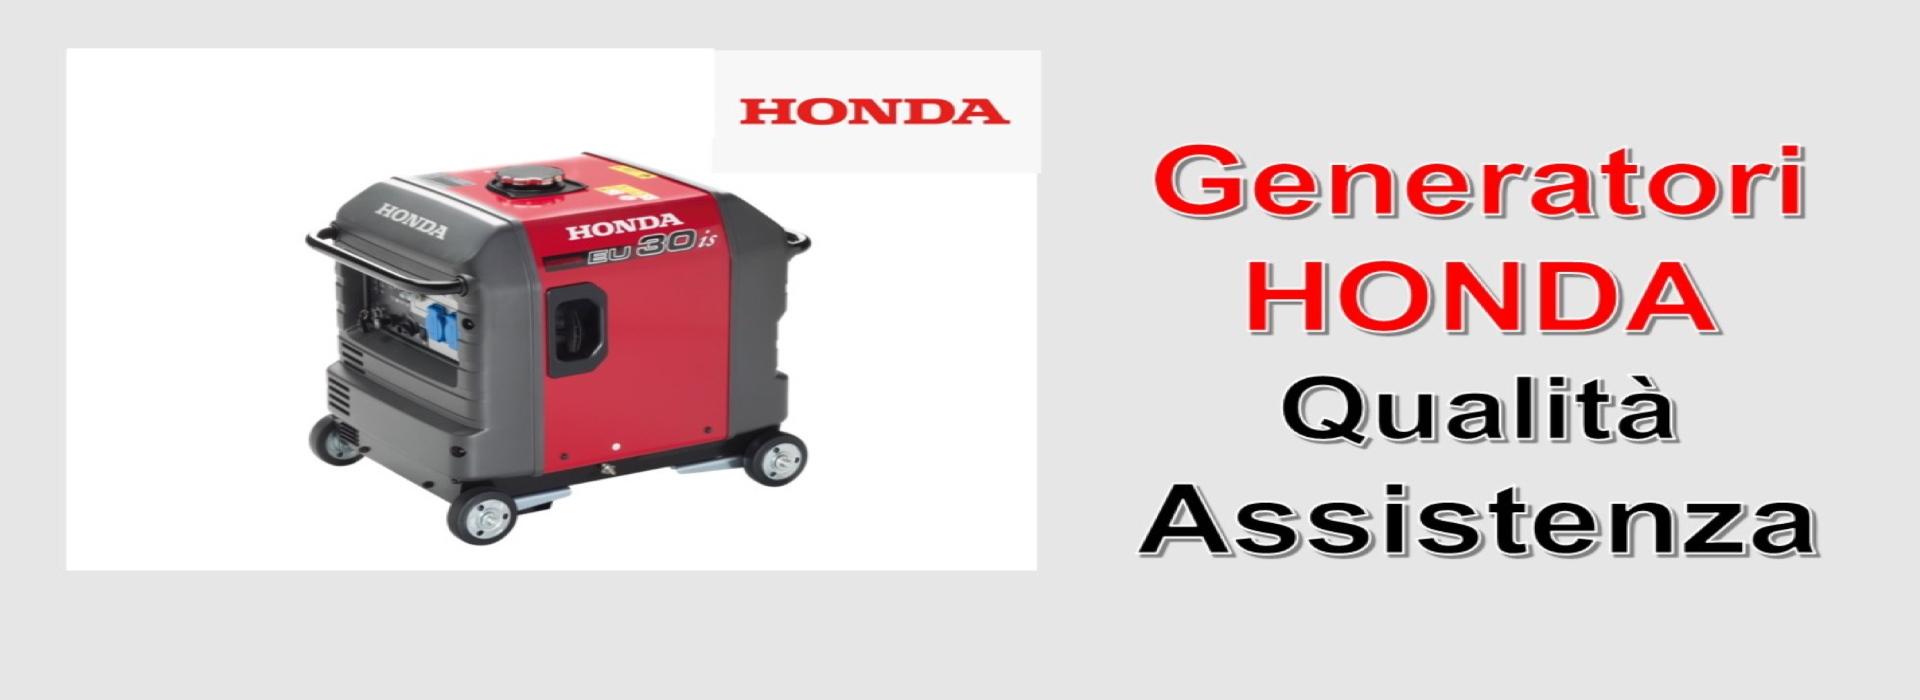 Generatori HONDA INVERTER Online